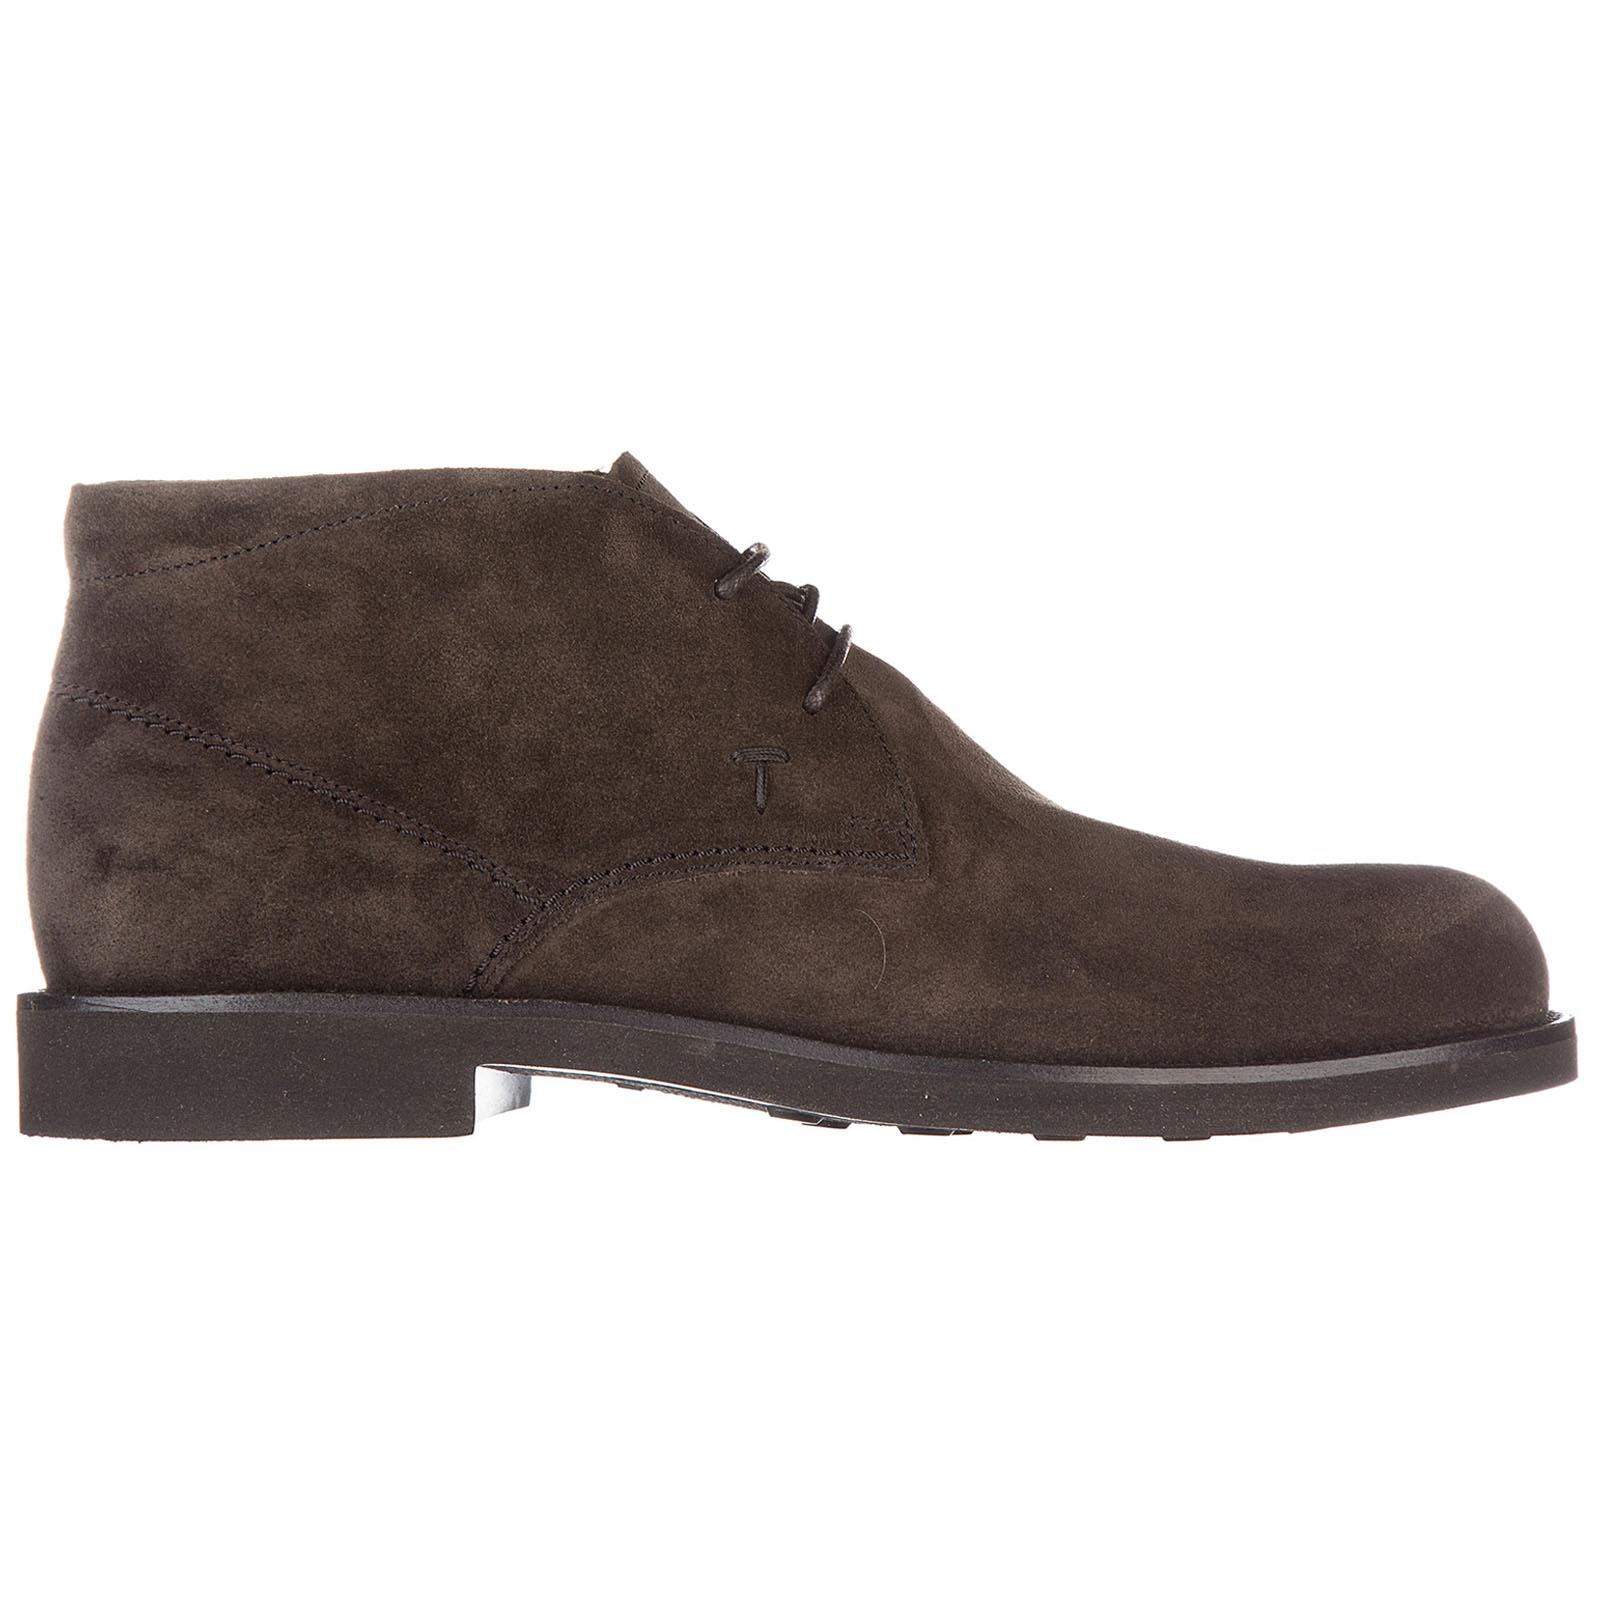 Botines zapatos en ante hombres gomma light